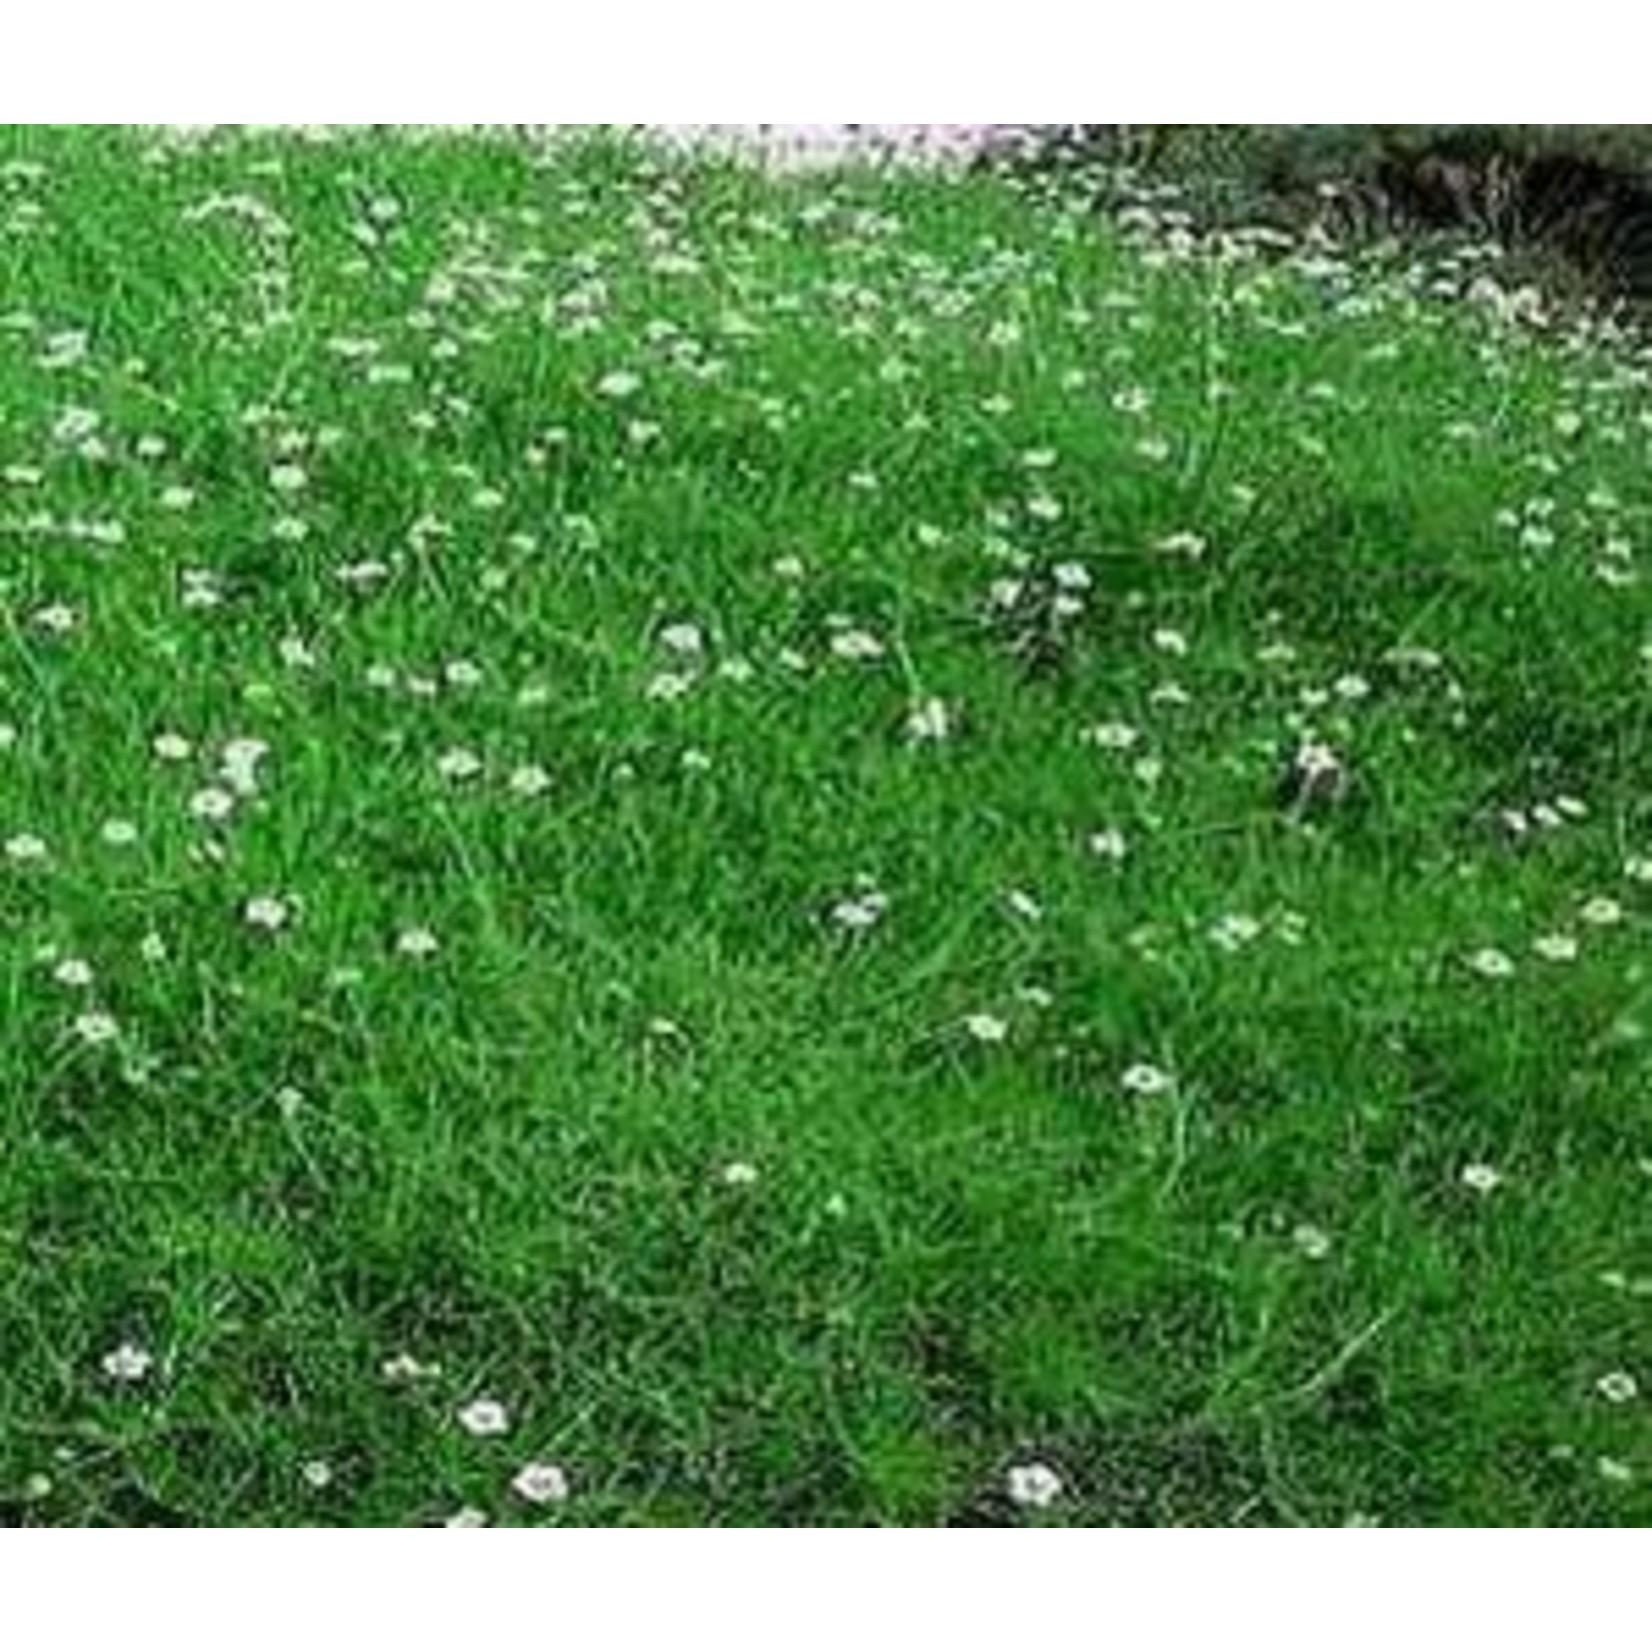 Crispy Irish Moss 'sagina subulata' - 1 qt